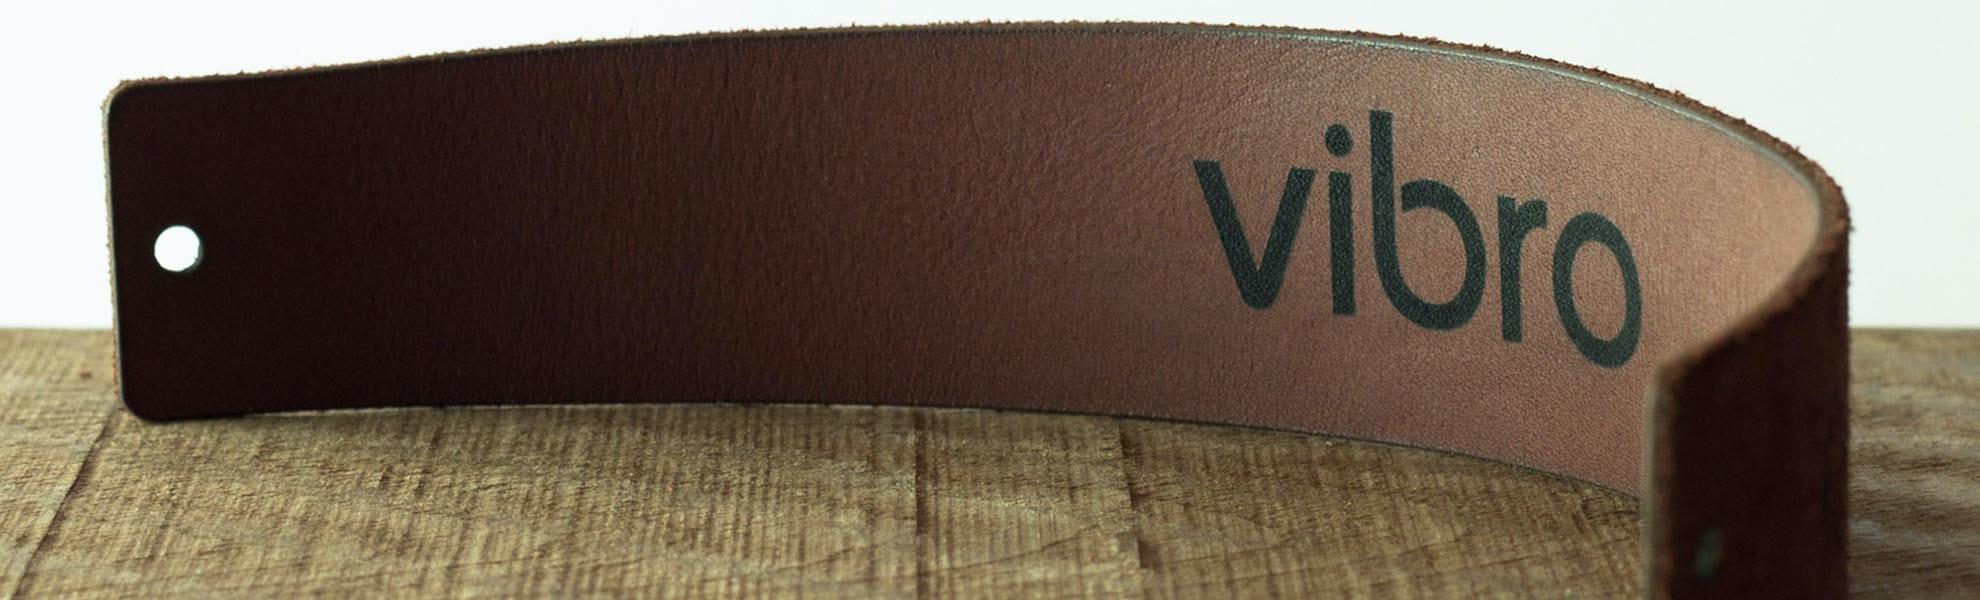 Vibro T50RP Comfort Headband